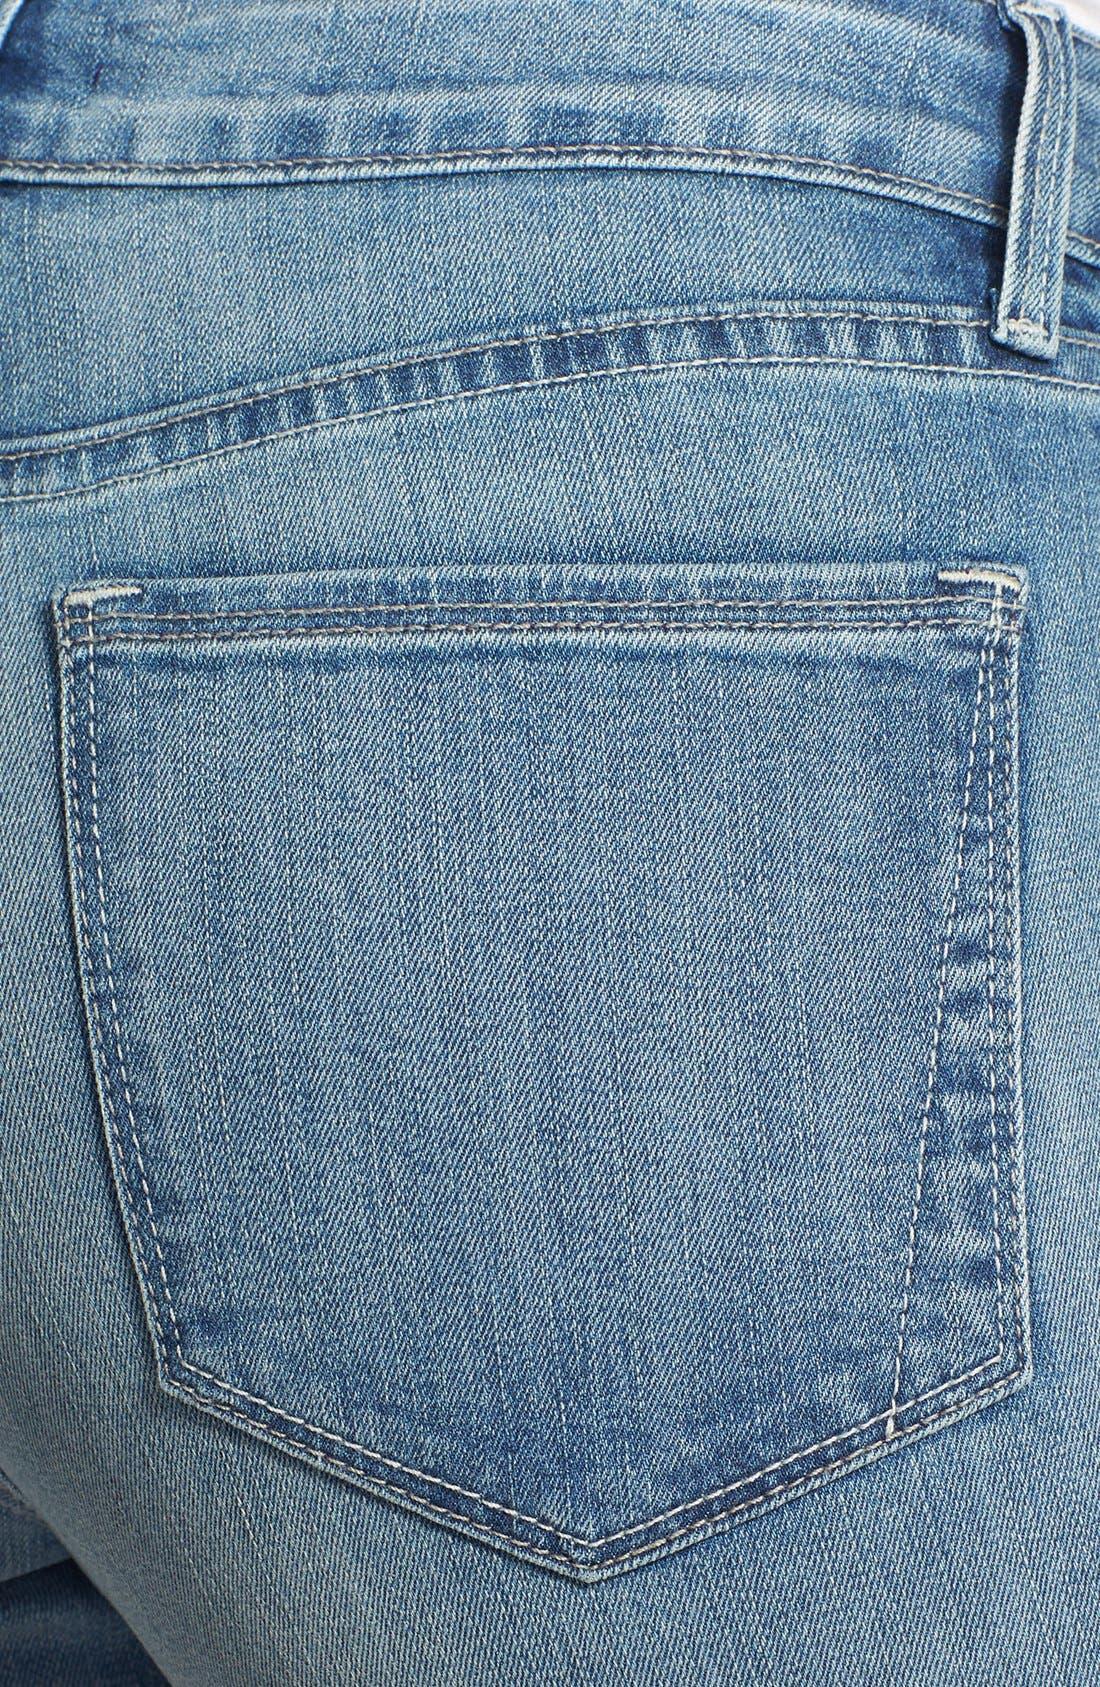 Alternate Image 3  - NYDJ 'Annalynn' Side Inset Stretch Skinny Jeans (Stockton) (Regular & Petite)